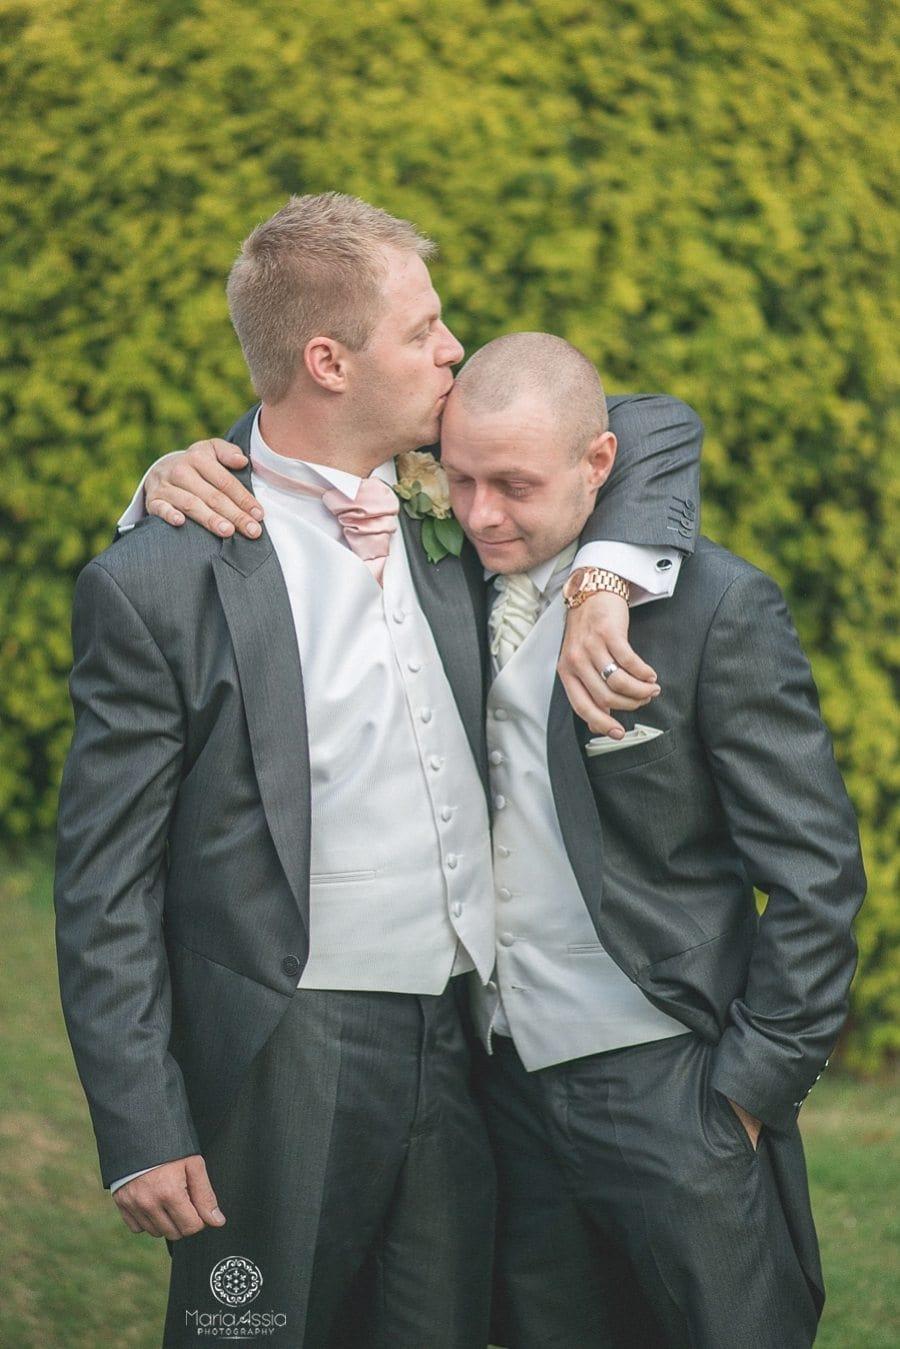 Groom and his best man hugging